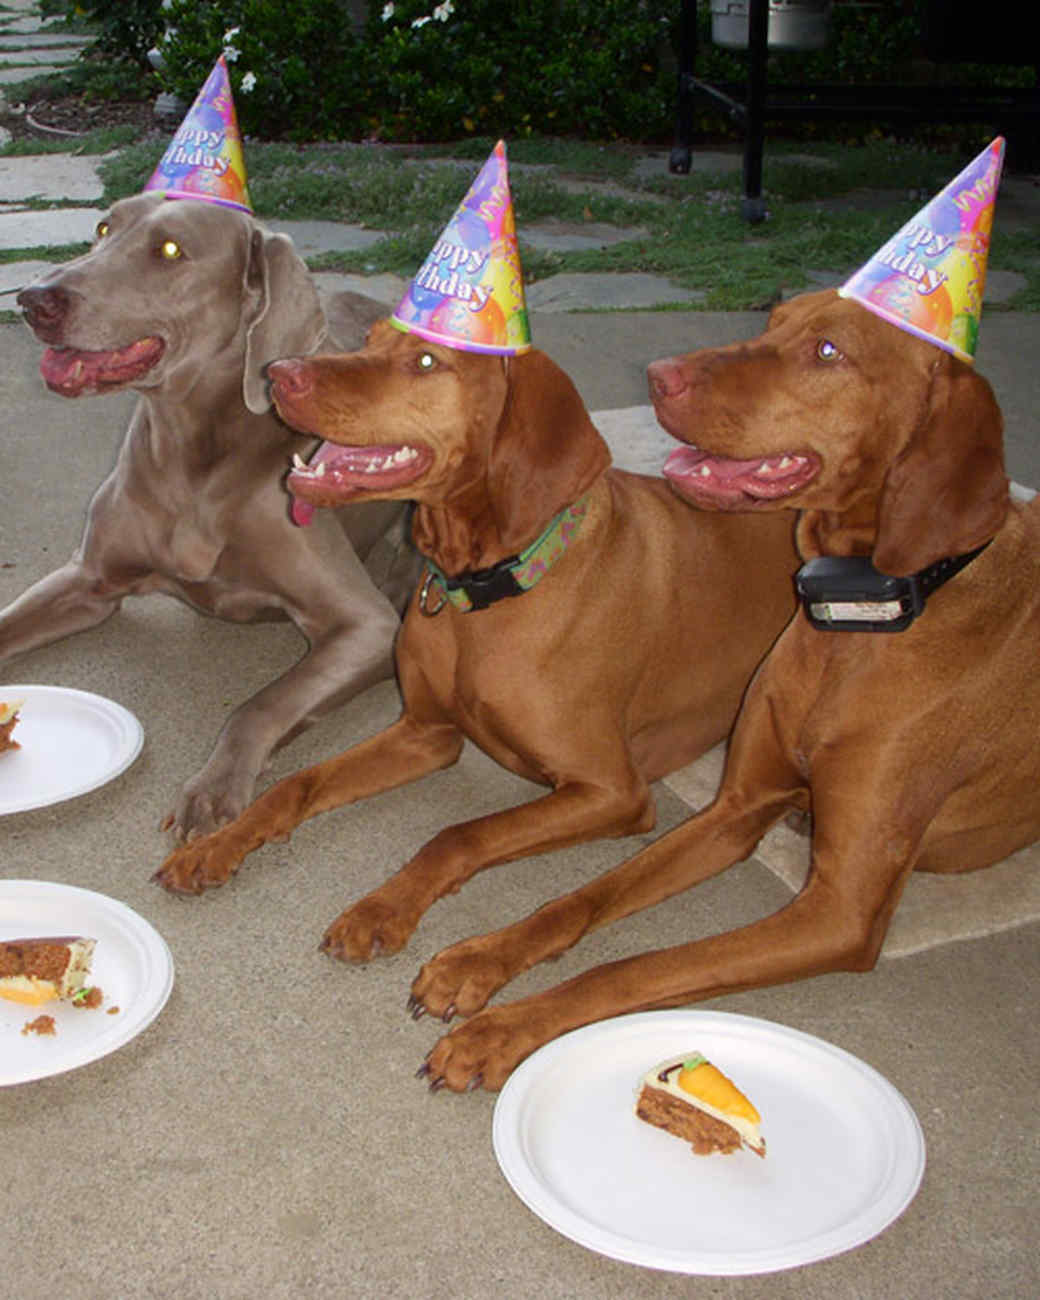 party_animals_photo_contest_86827.jpg